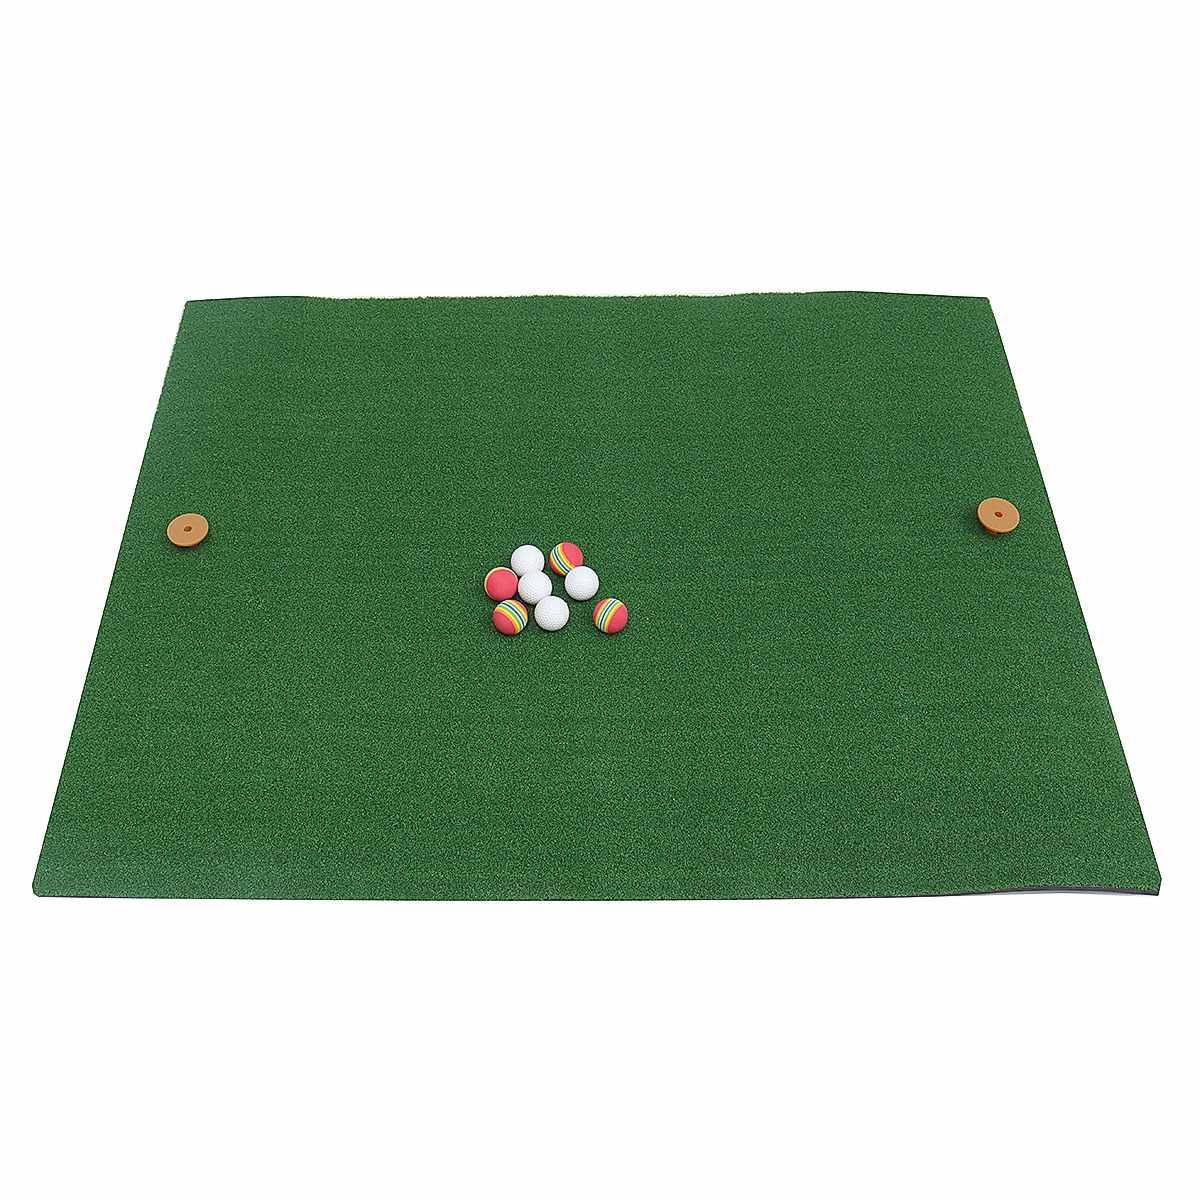 125X100cm Indoor Backyard Golf Mat Training Hitting Pad Practice Rubber Tee Holder Grass Mat Grassroot Green Golf Training Tools